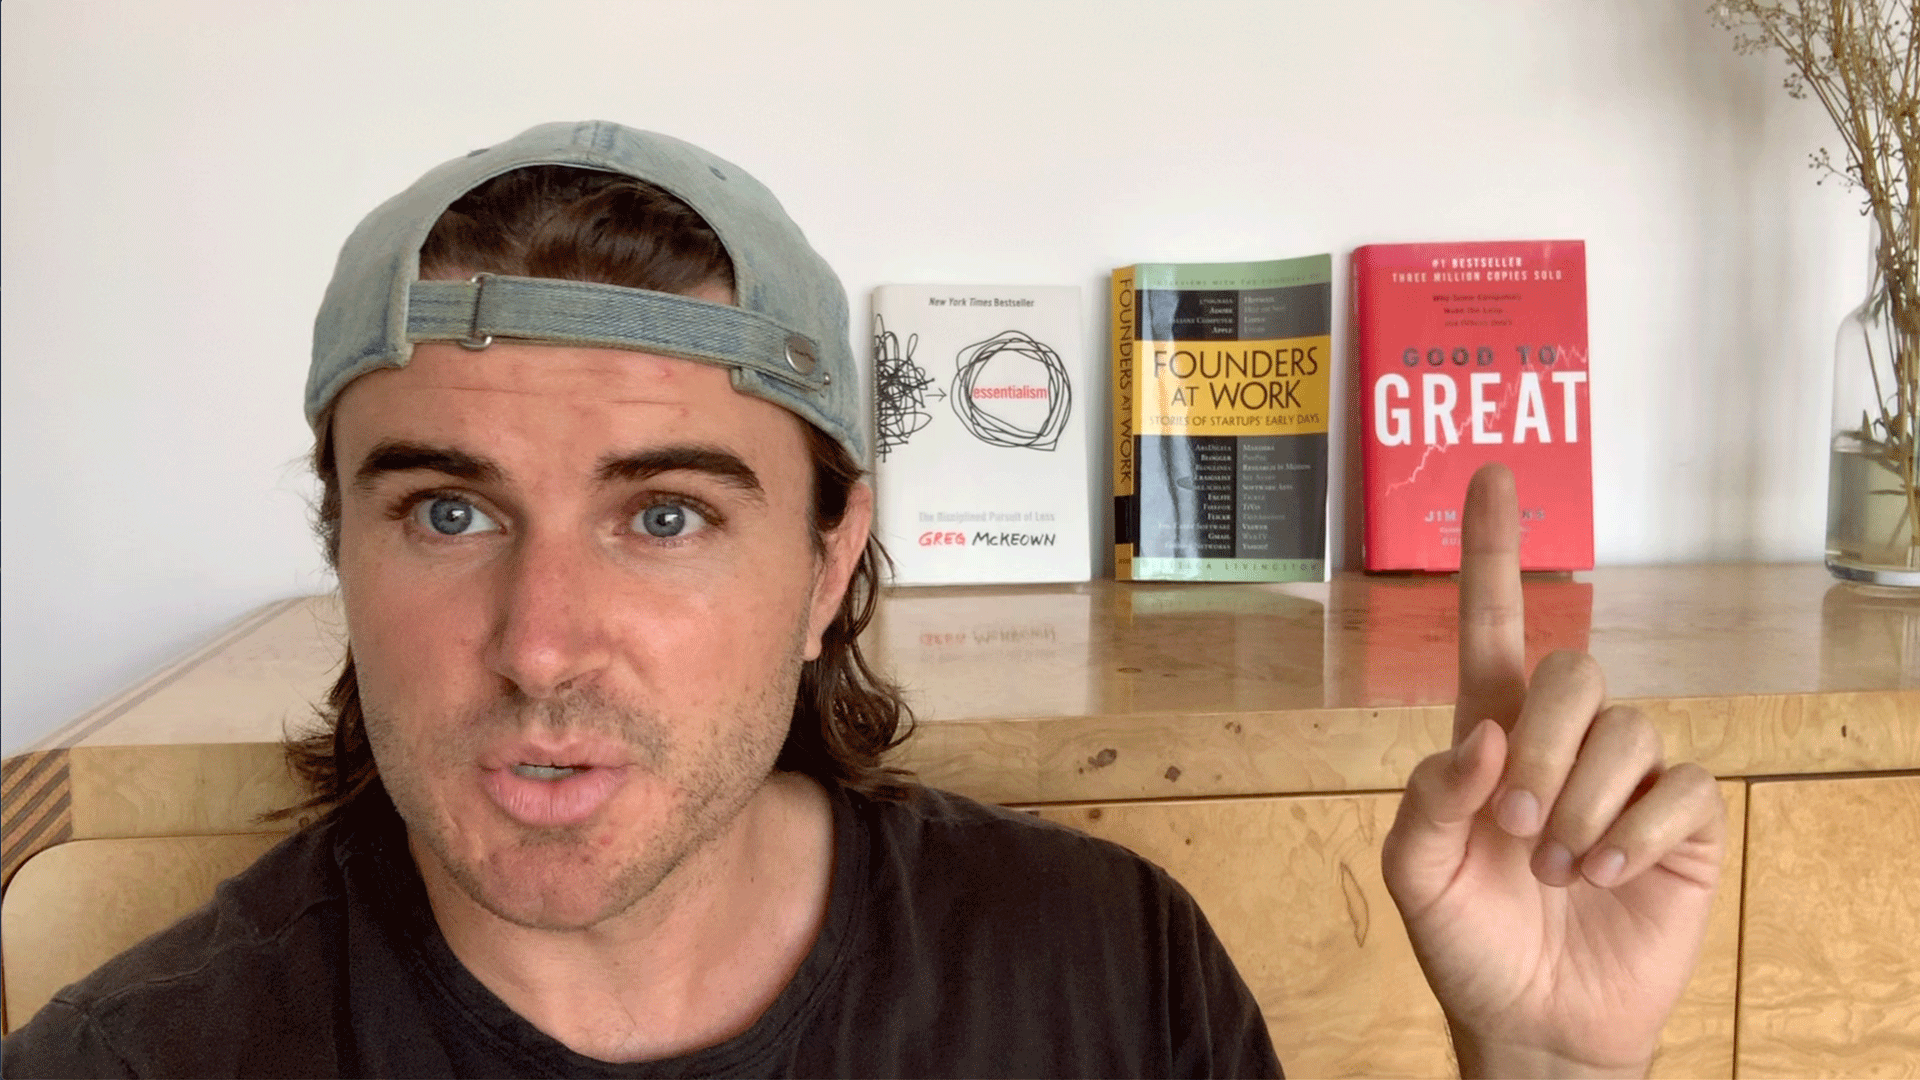 3 Good Books in 8-mins